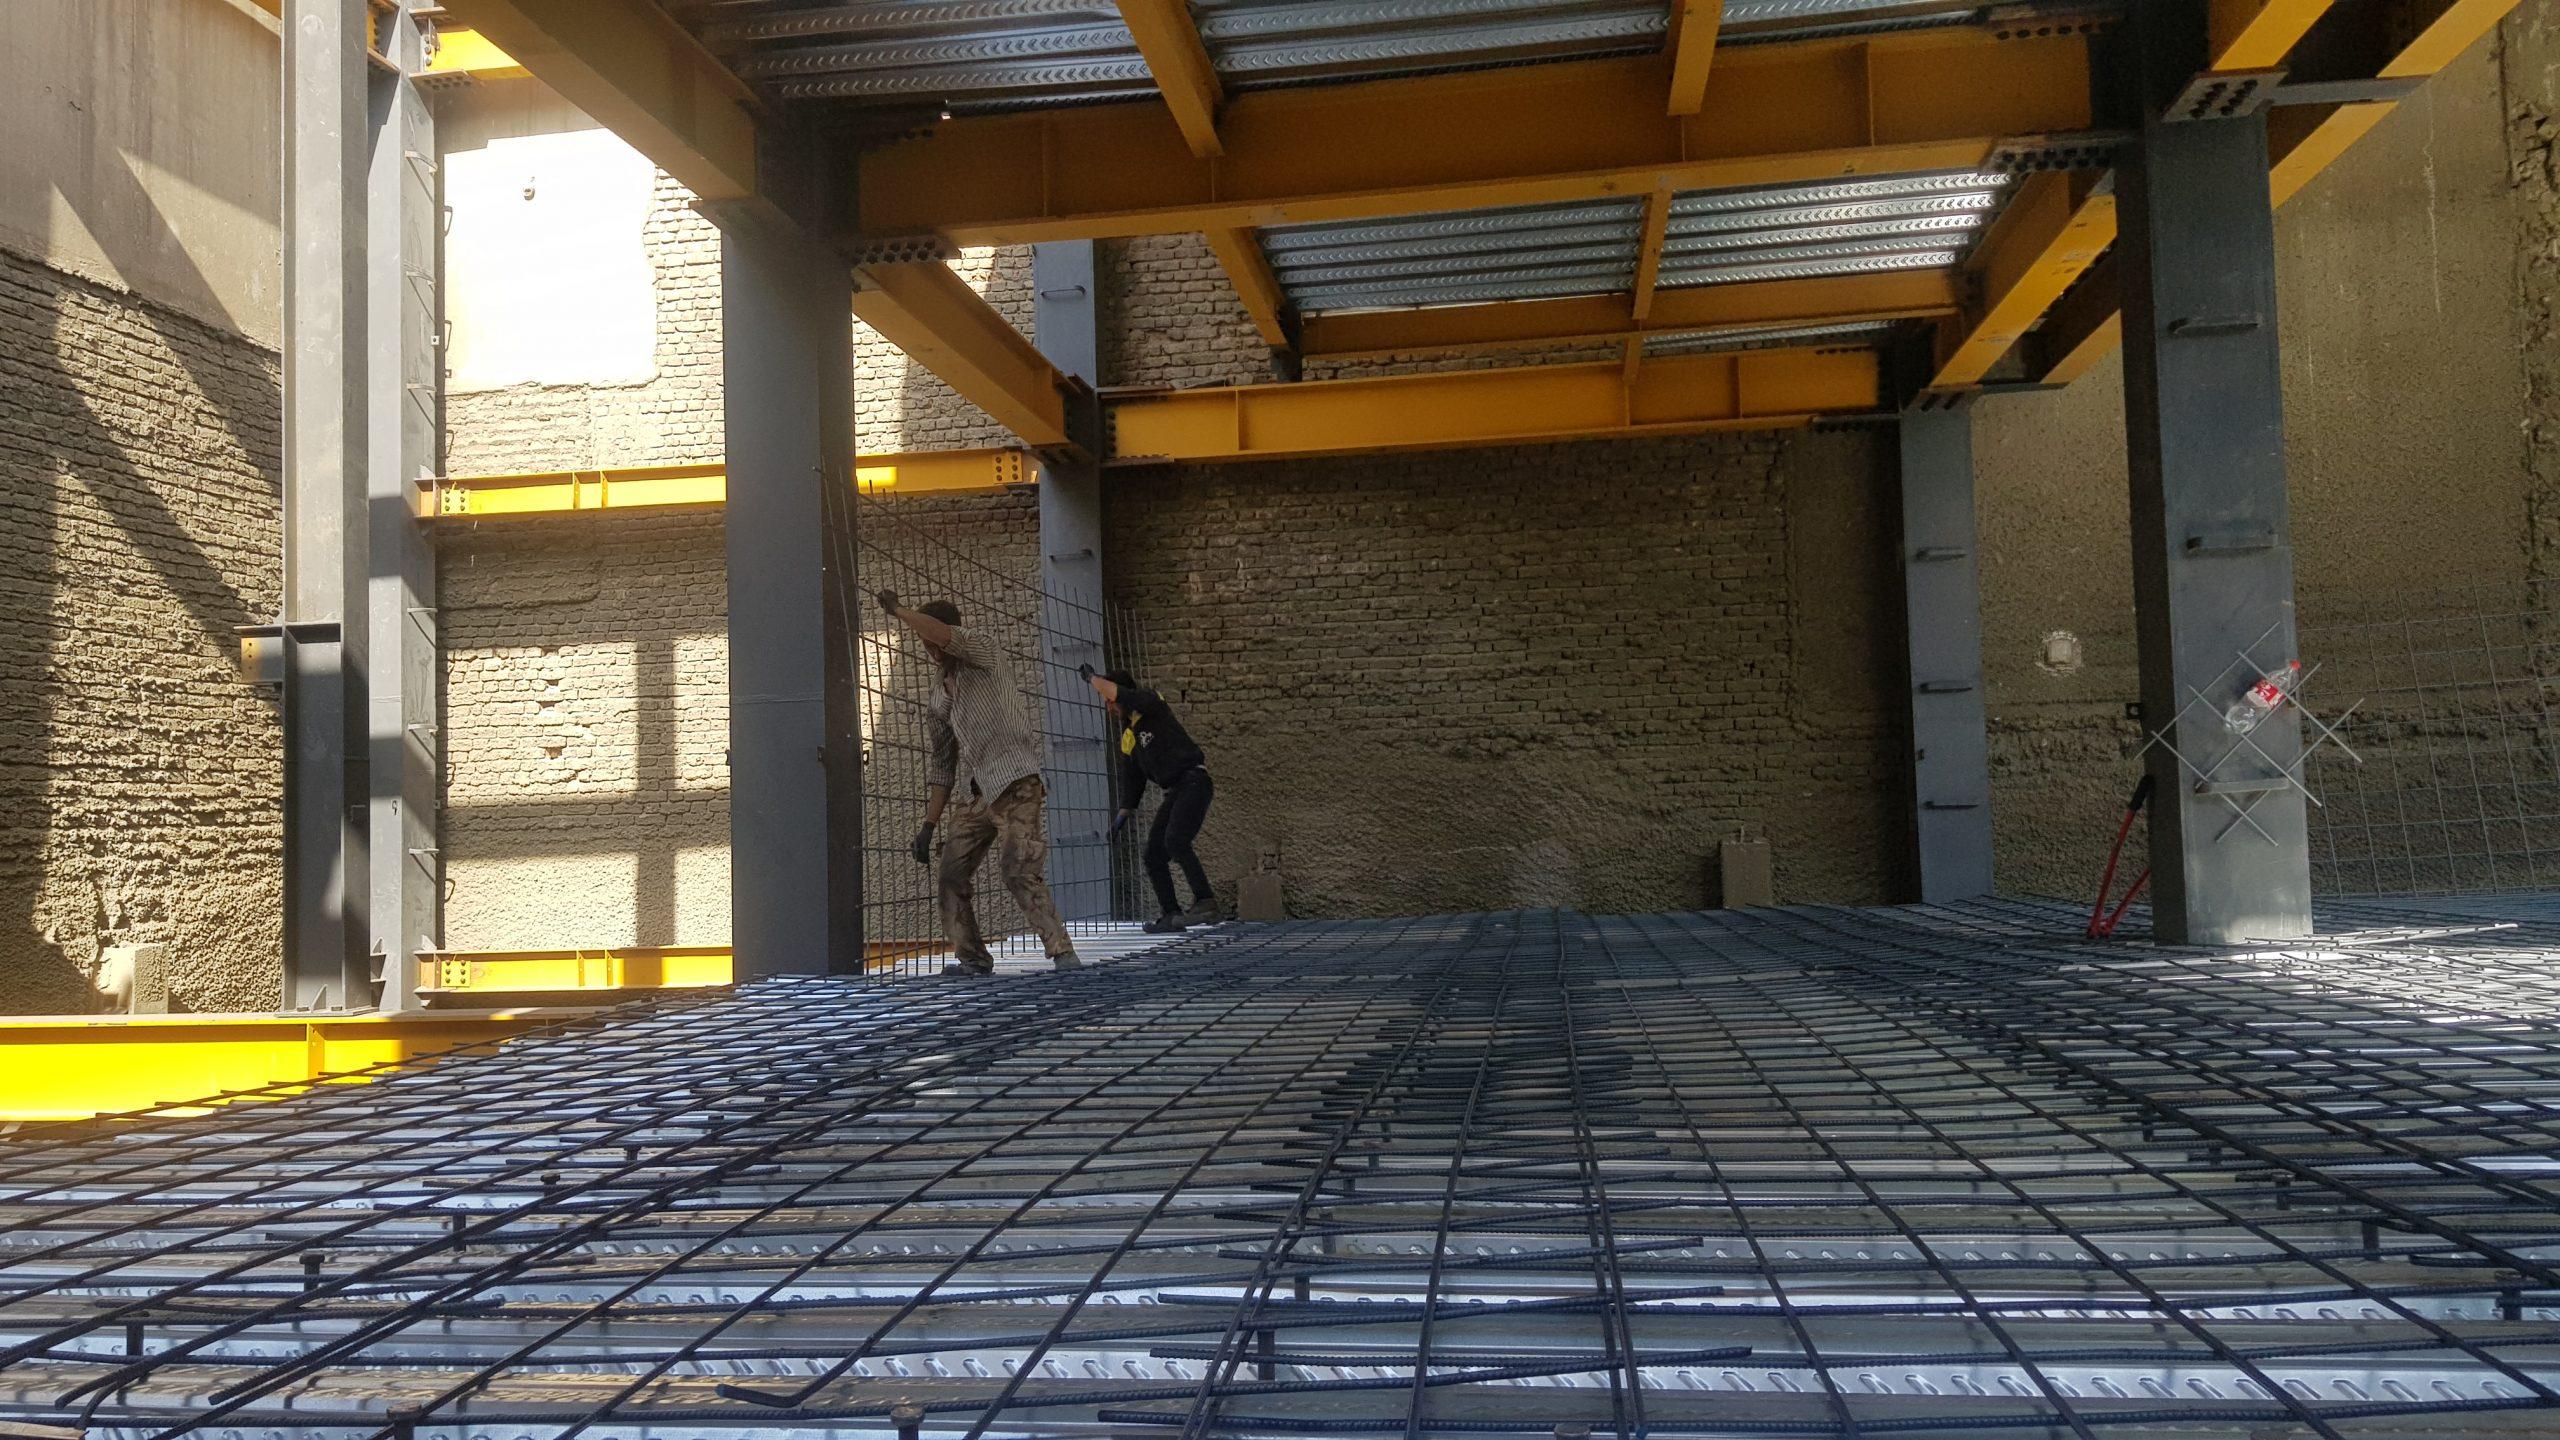 مزیت های سقف عرشه فولادی